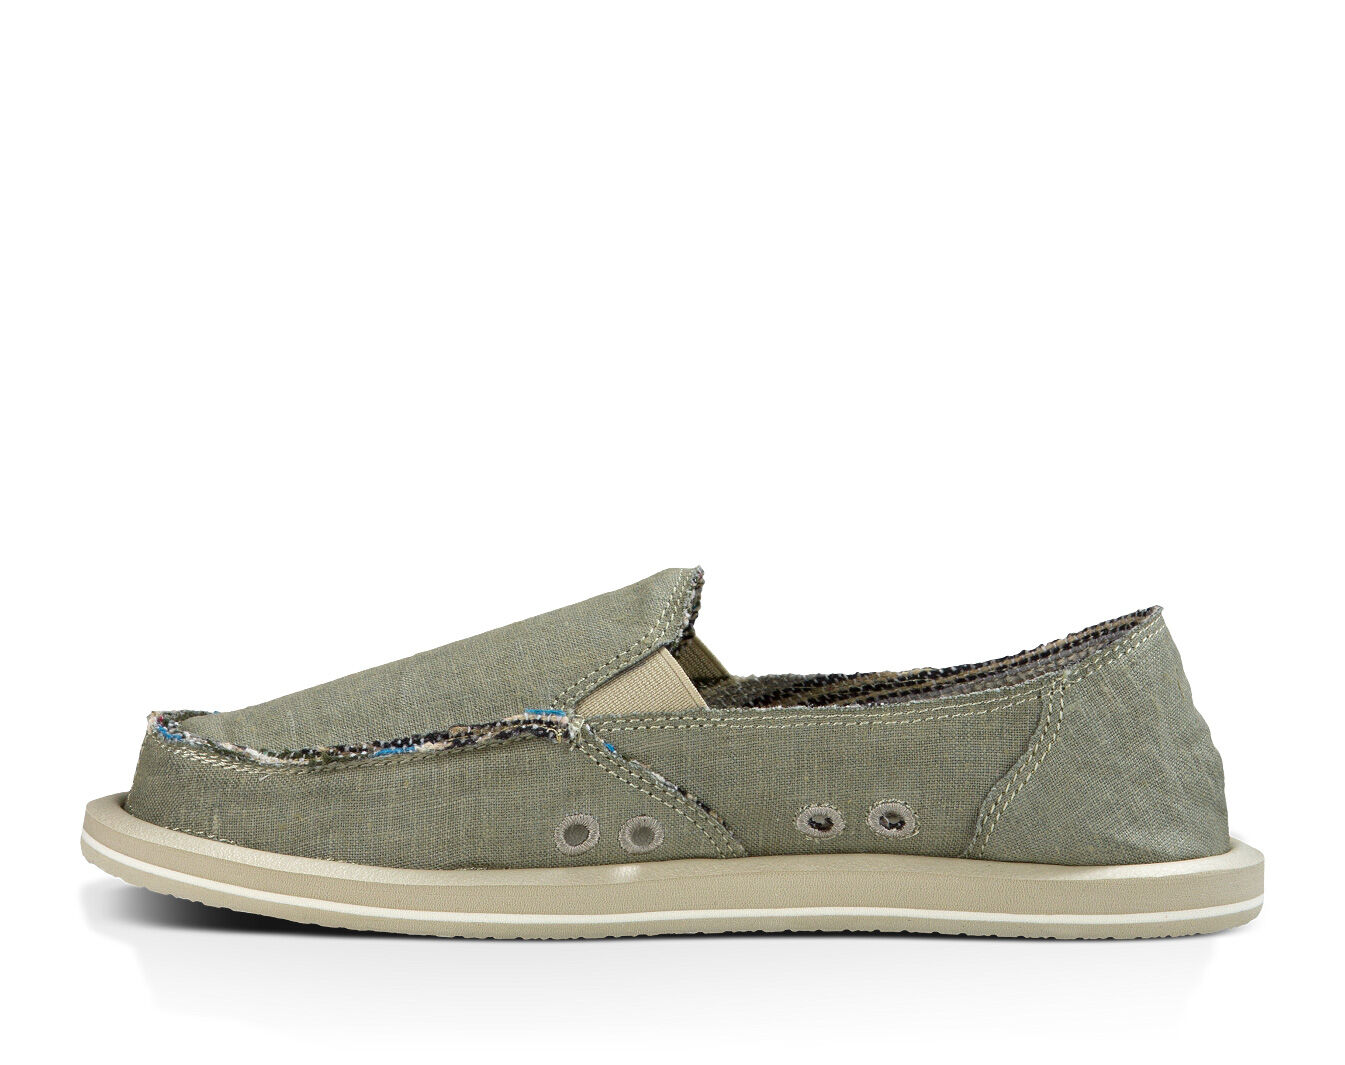 Women/'s Shoes Sanuk DONNA HEMP Casual Sidewalk Surfers SWF1160 OLIVE GREY